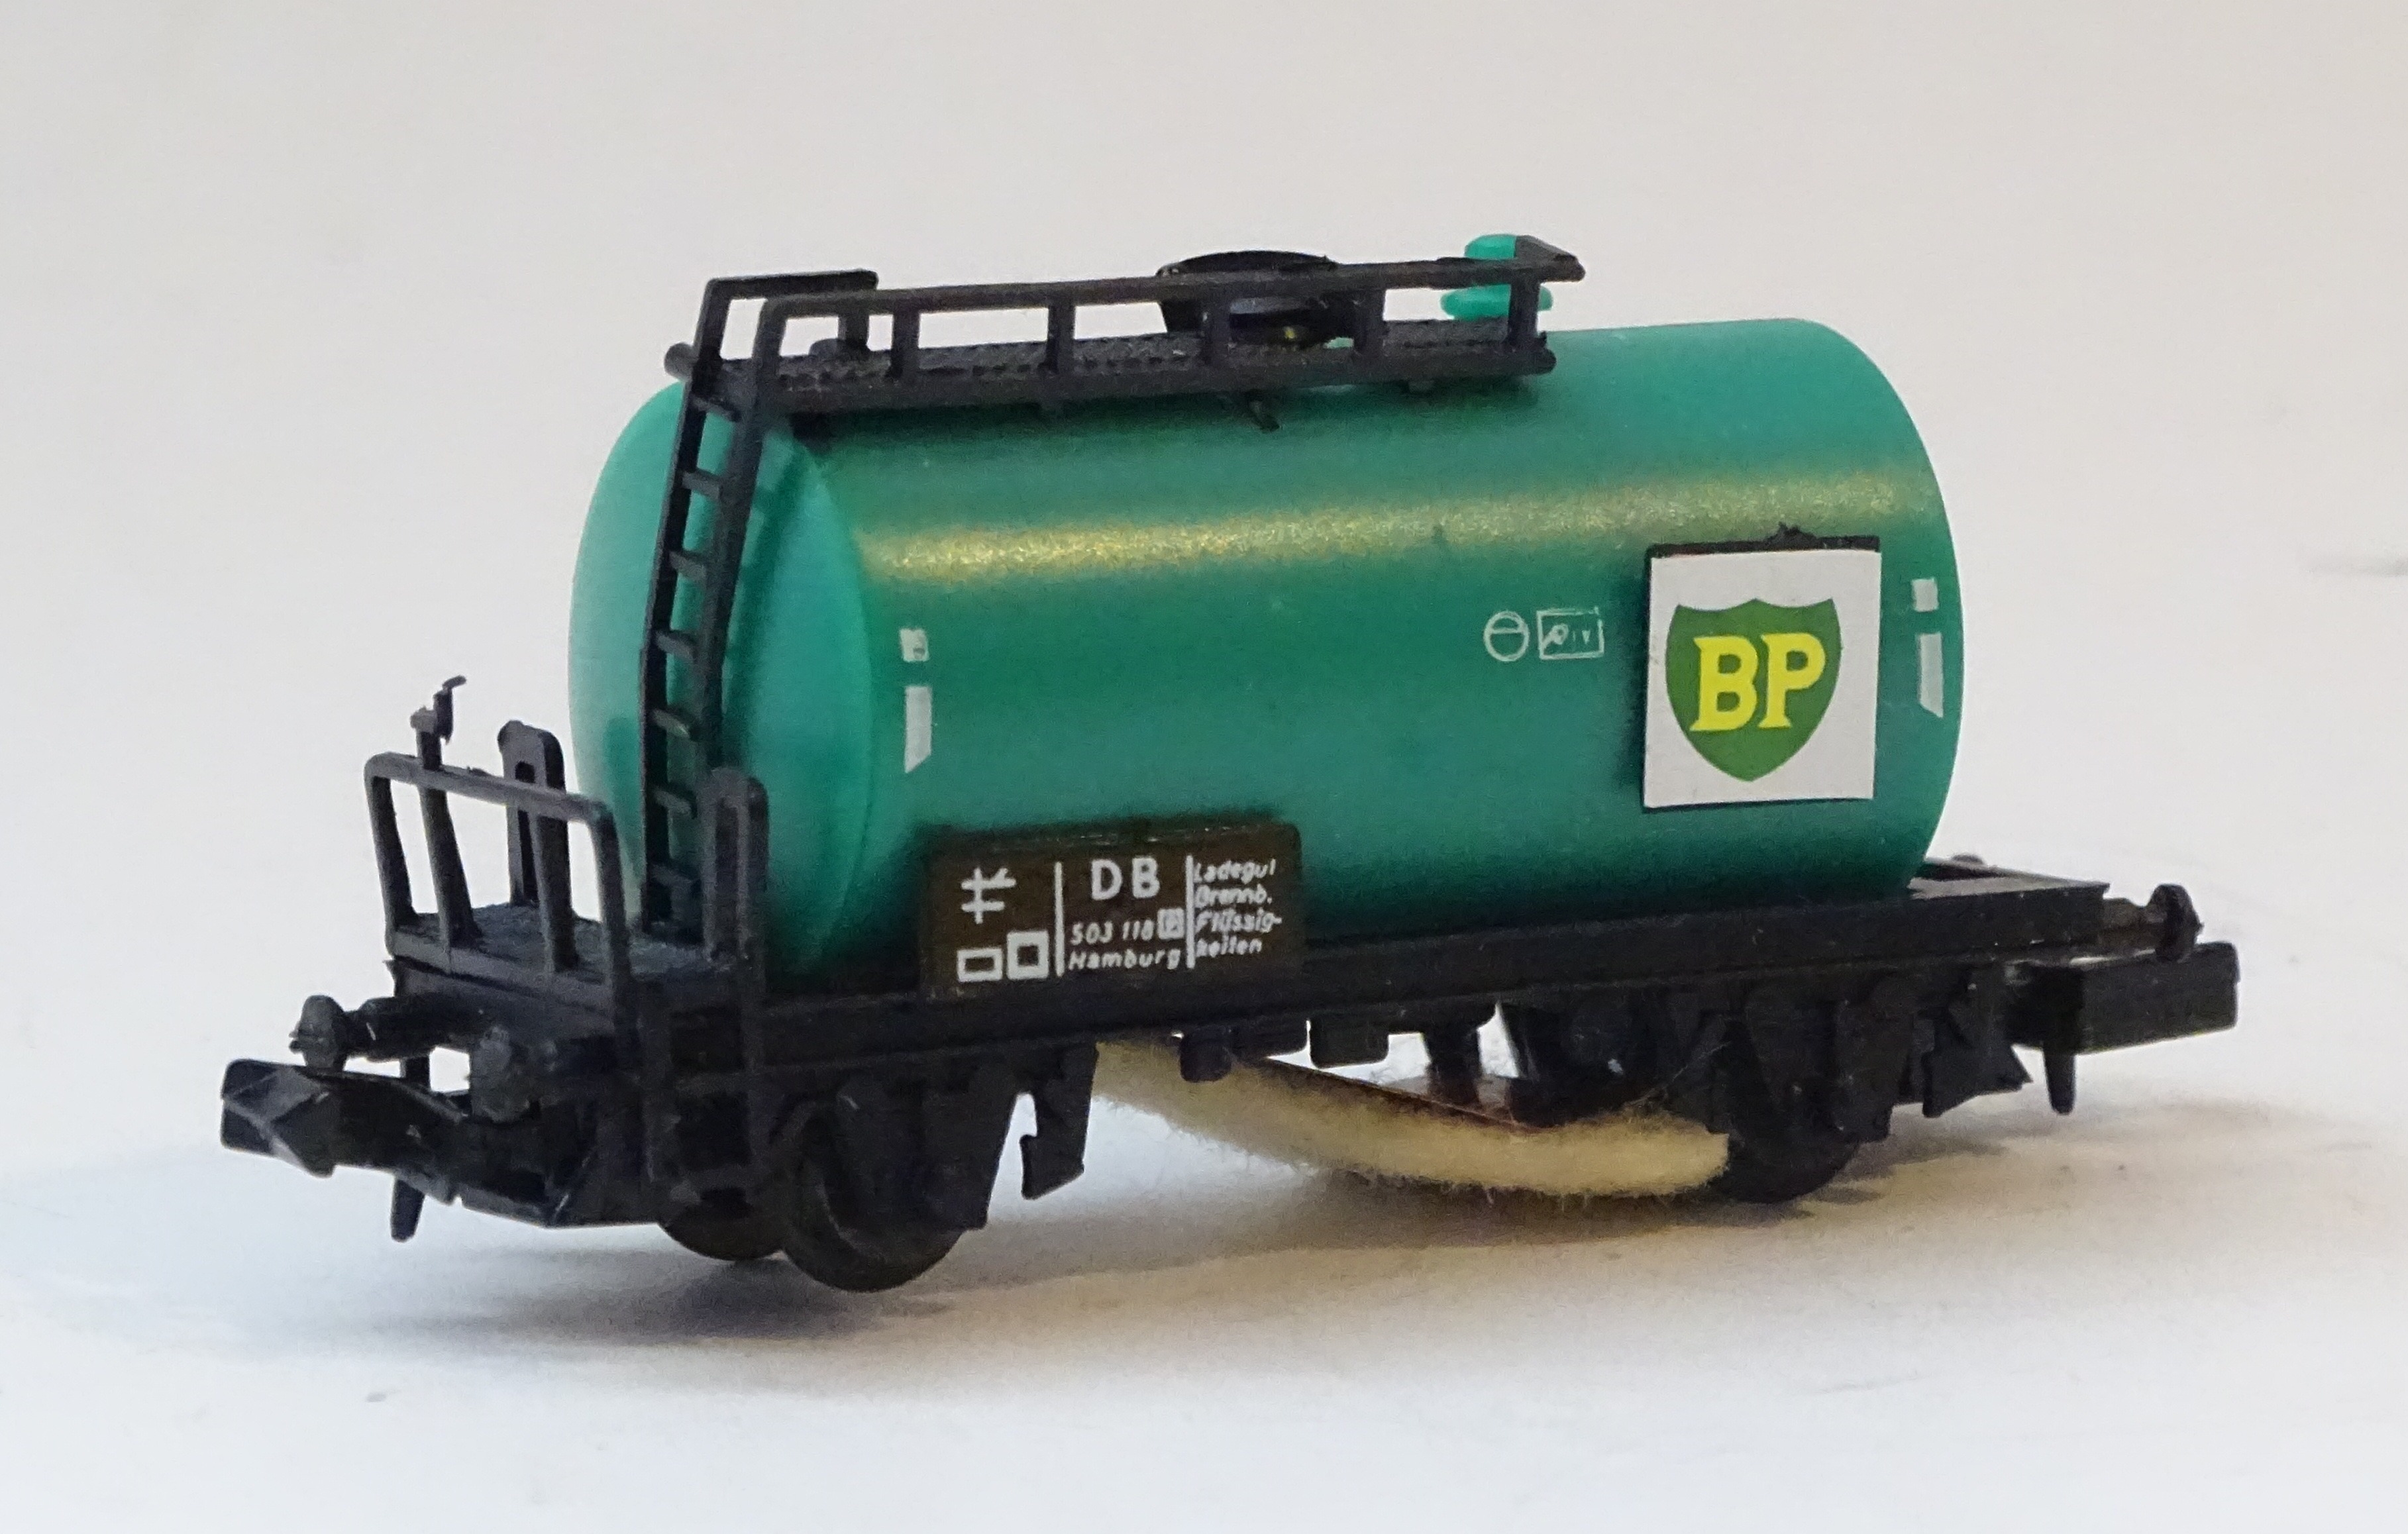 N Scale - Herkat - 1402 - Tank Car, No Dome, 2-Axle - British Petroleum - 503 118